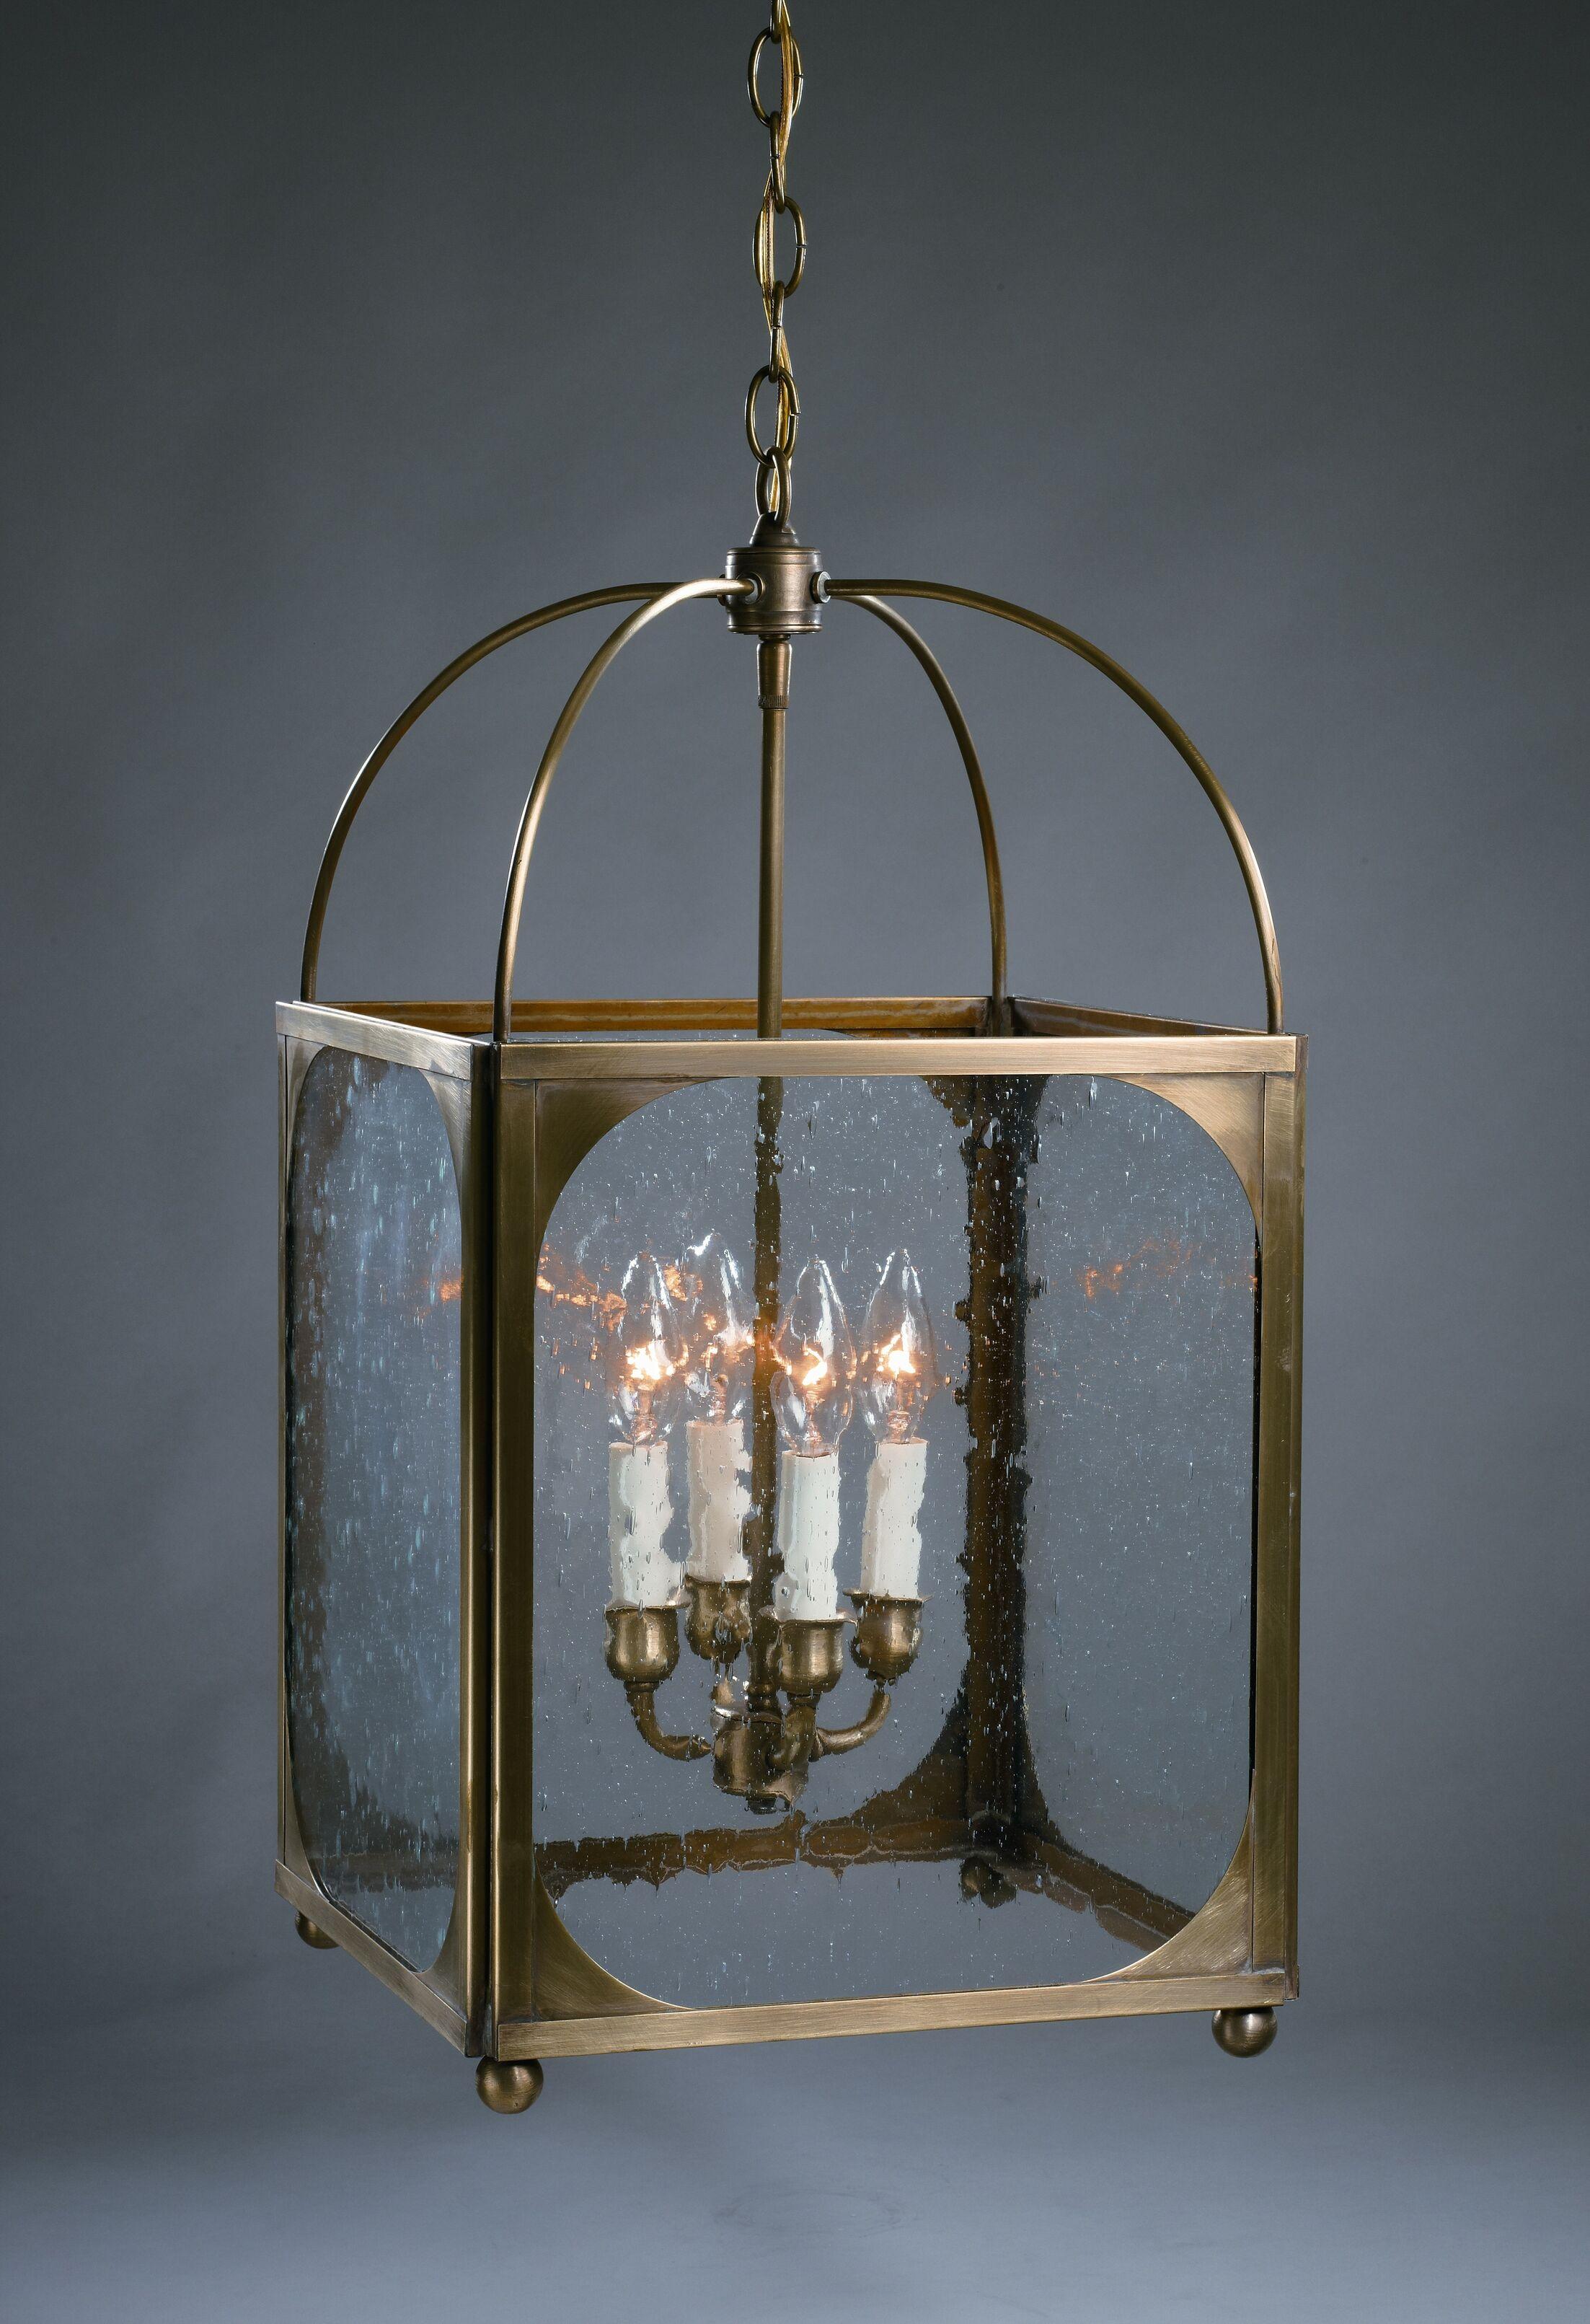 Chandelier 4-Light Foyer Pendant Finish: Antique Copper, Glass Type: Clear